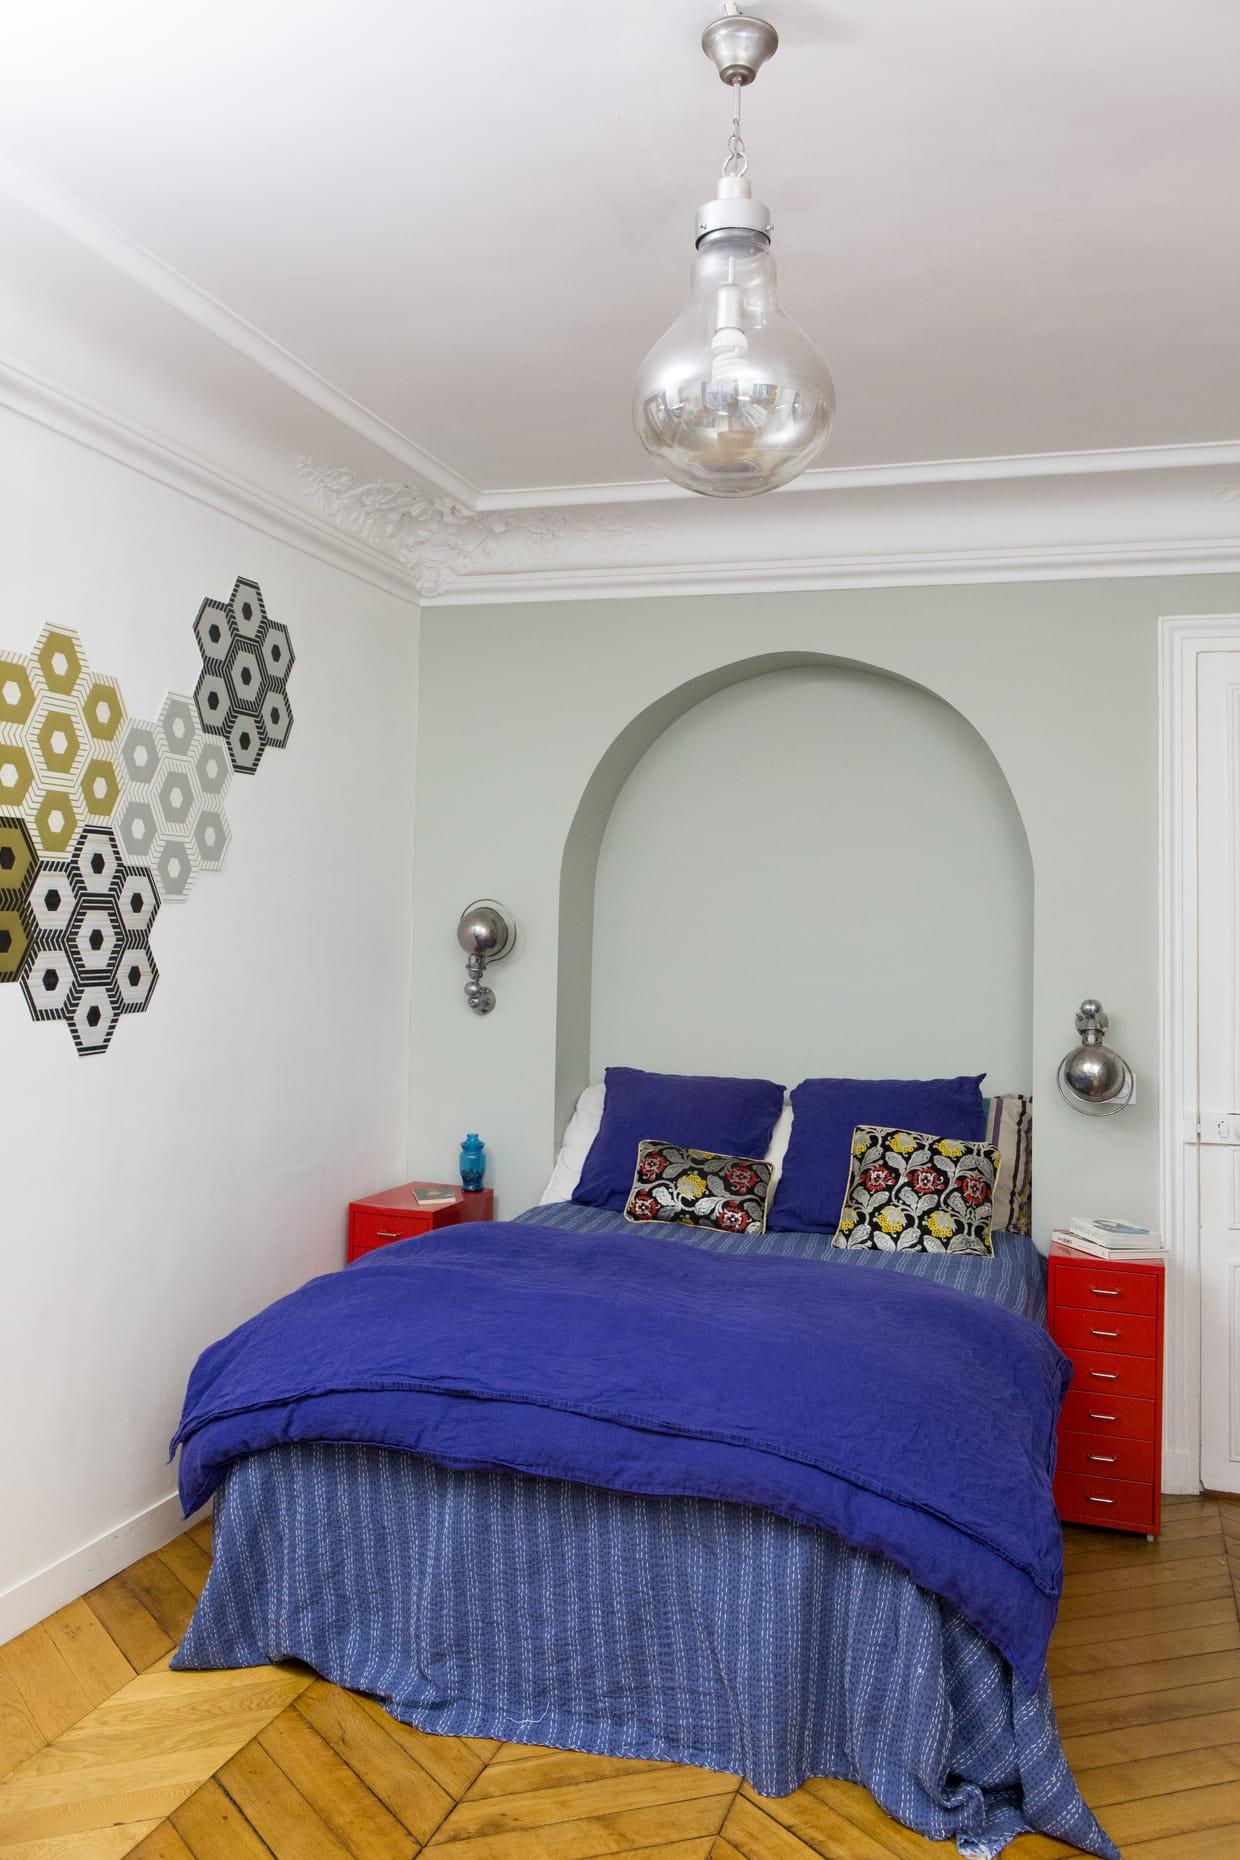 Chambre bleu violet for Chambre bleu et mauve